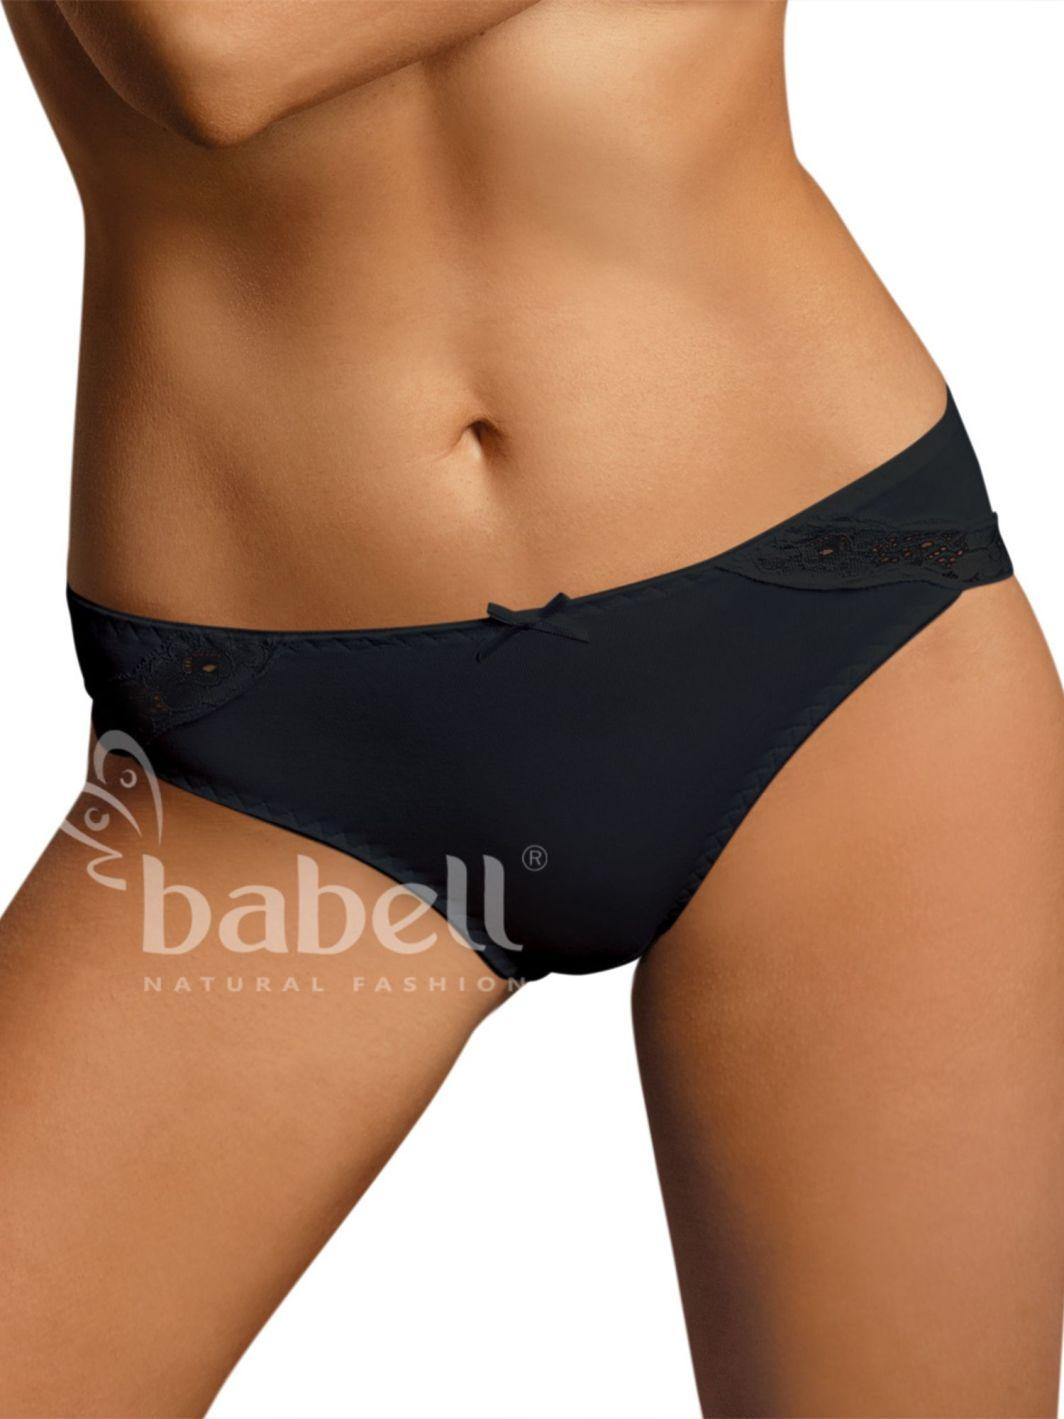 Babell Figi bbl 019 czarne r. S 1